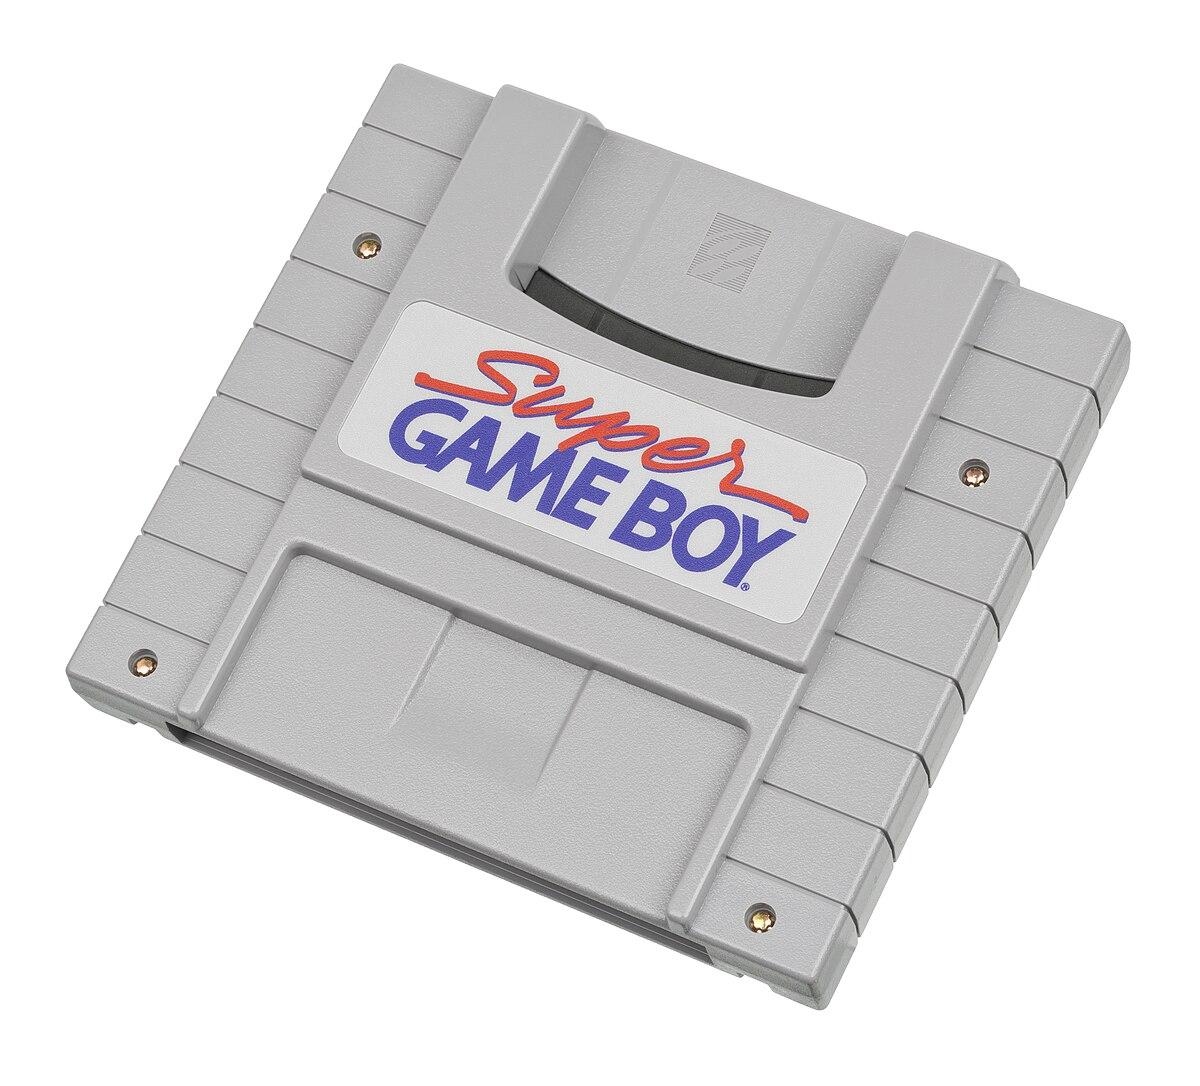 Game boy color online free - Game Boy Color Online Free 46